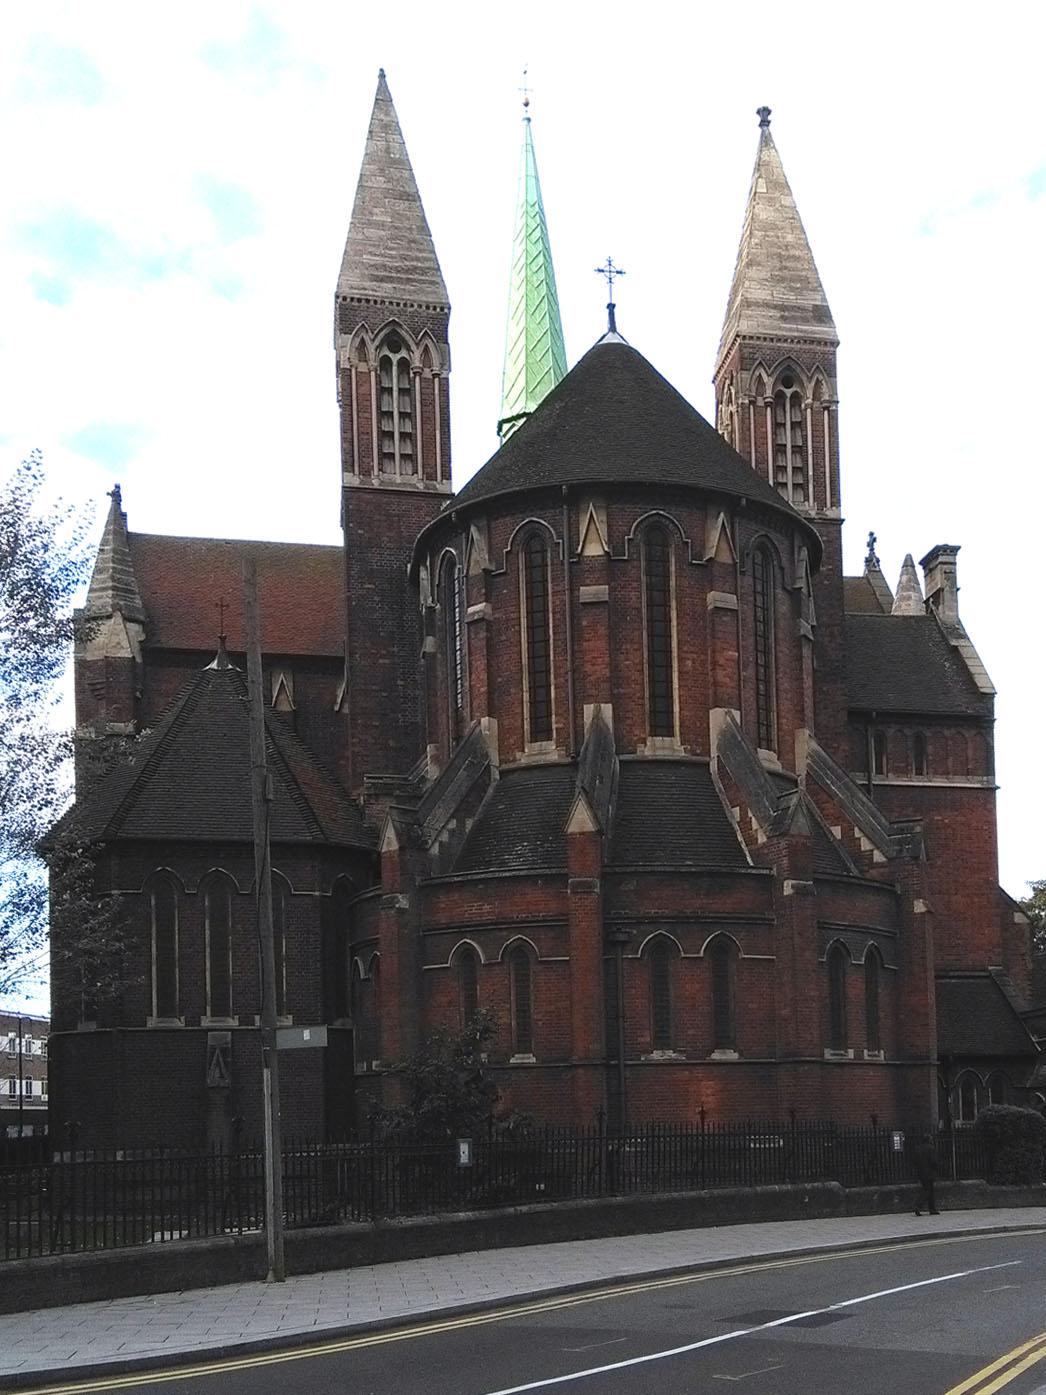 St Michael & All Angels, Croydon (Exterior)